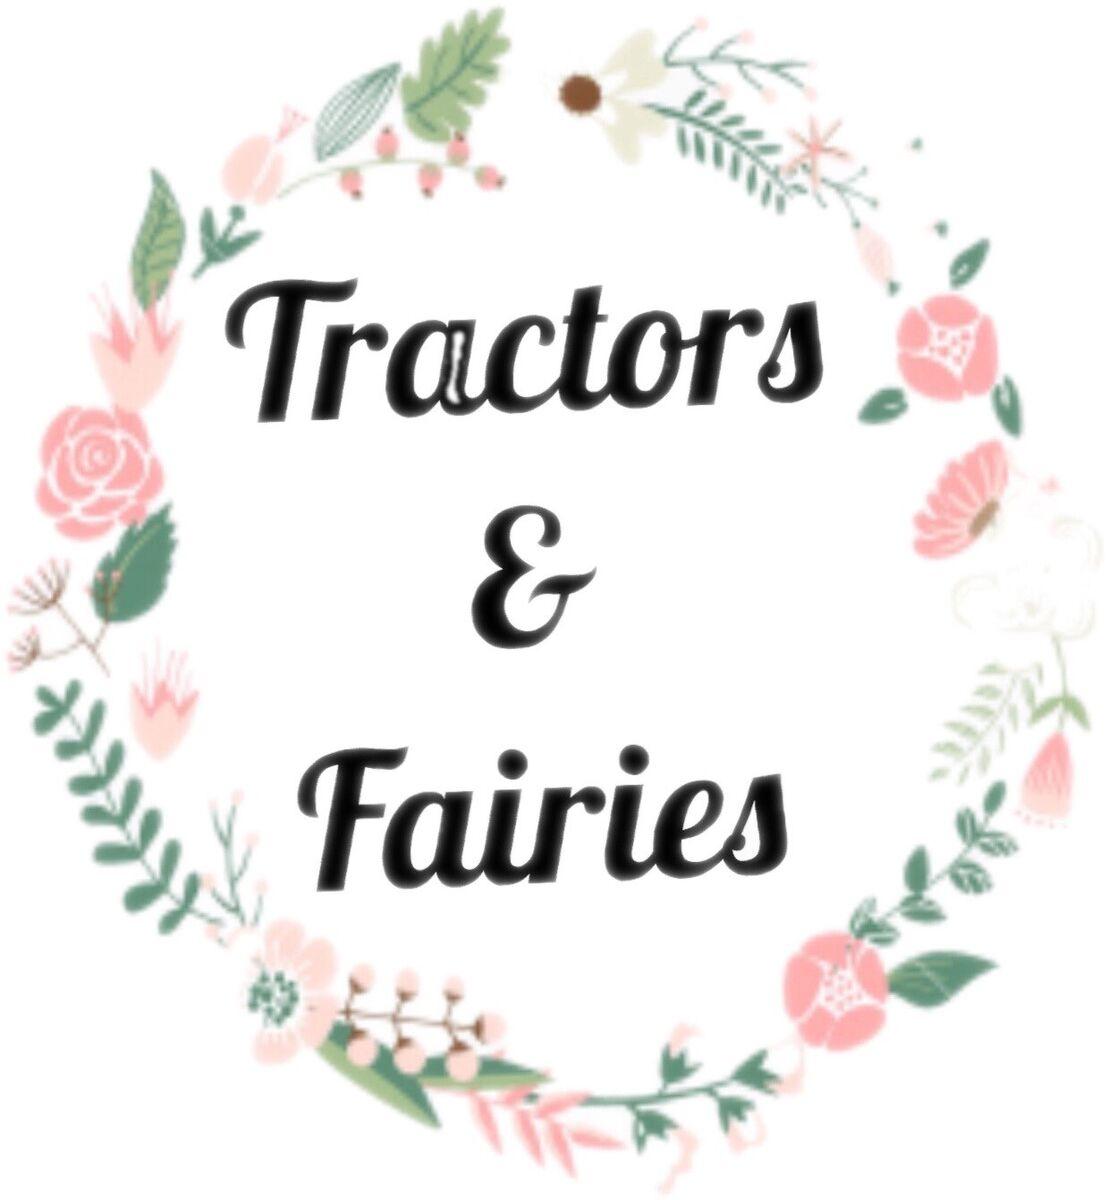 Tractors & Fairies